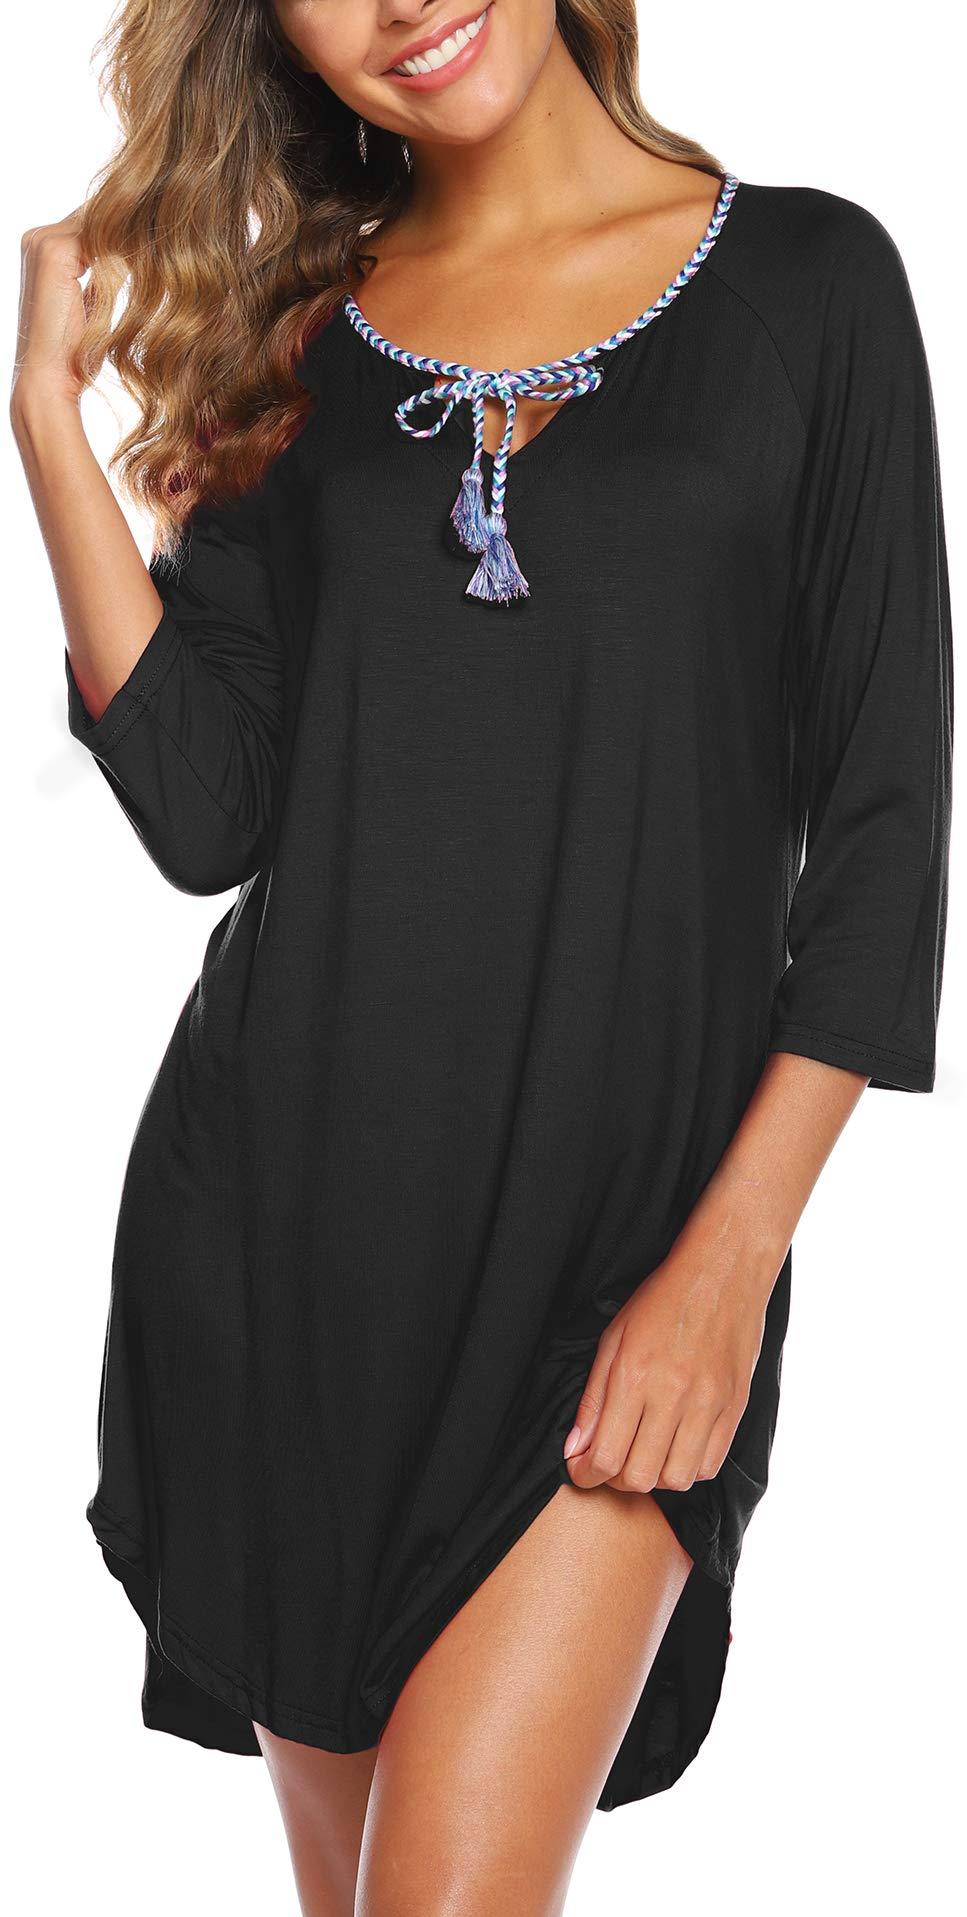 ZEGOLO Womens Maternity Nightgown Dress 3/4 Sleeve Nursing Pregnancy Loungewear Sleep Dress